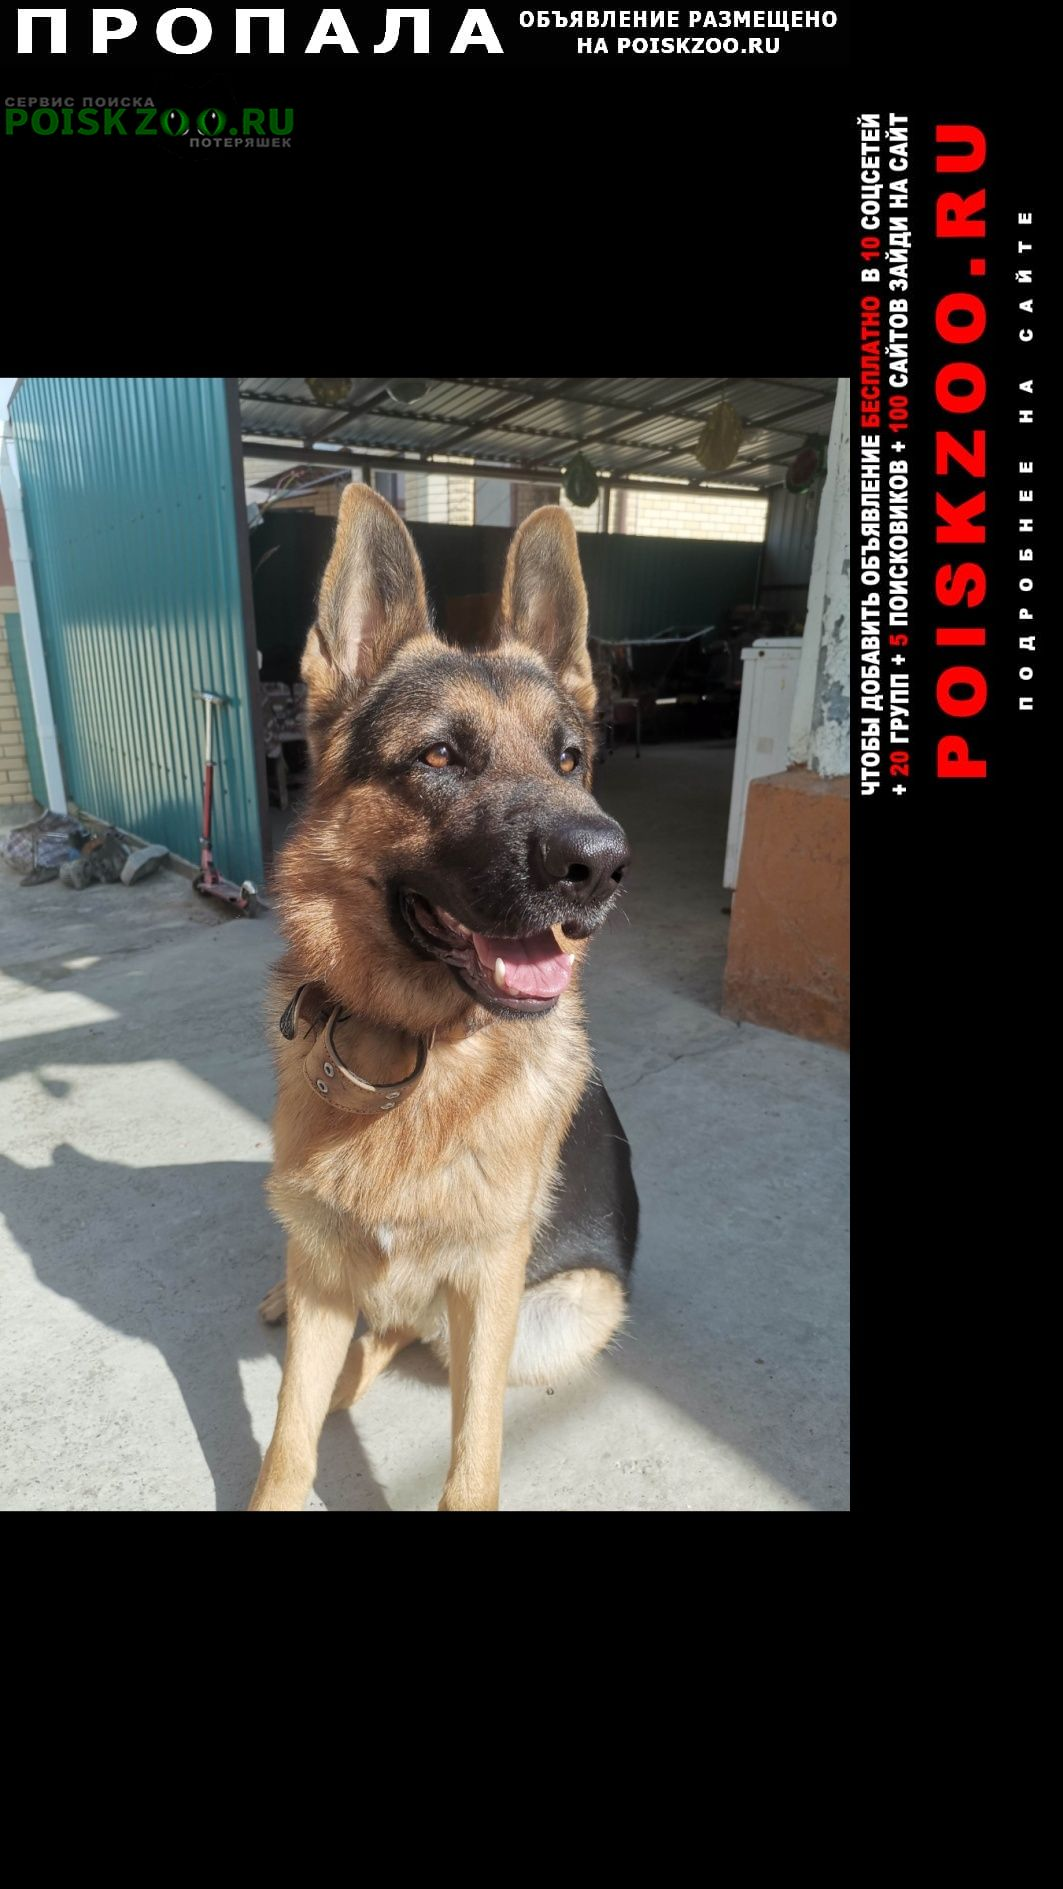 Пропала собака пес. немецкая овчарка. Анапа